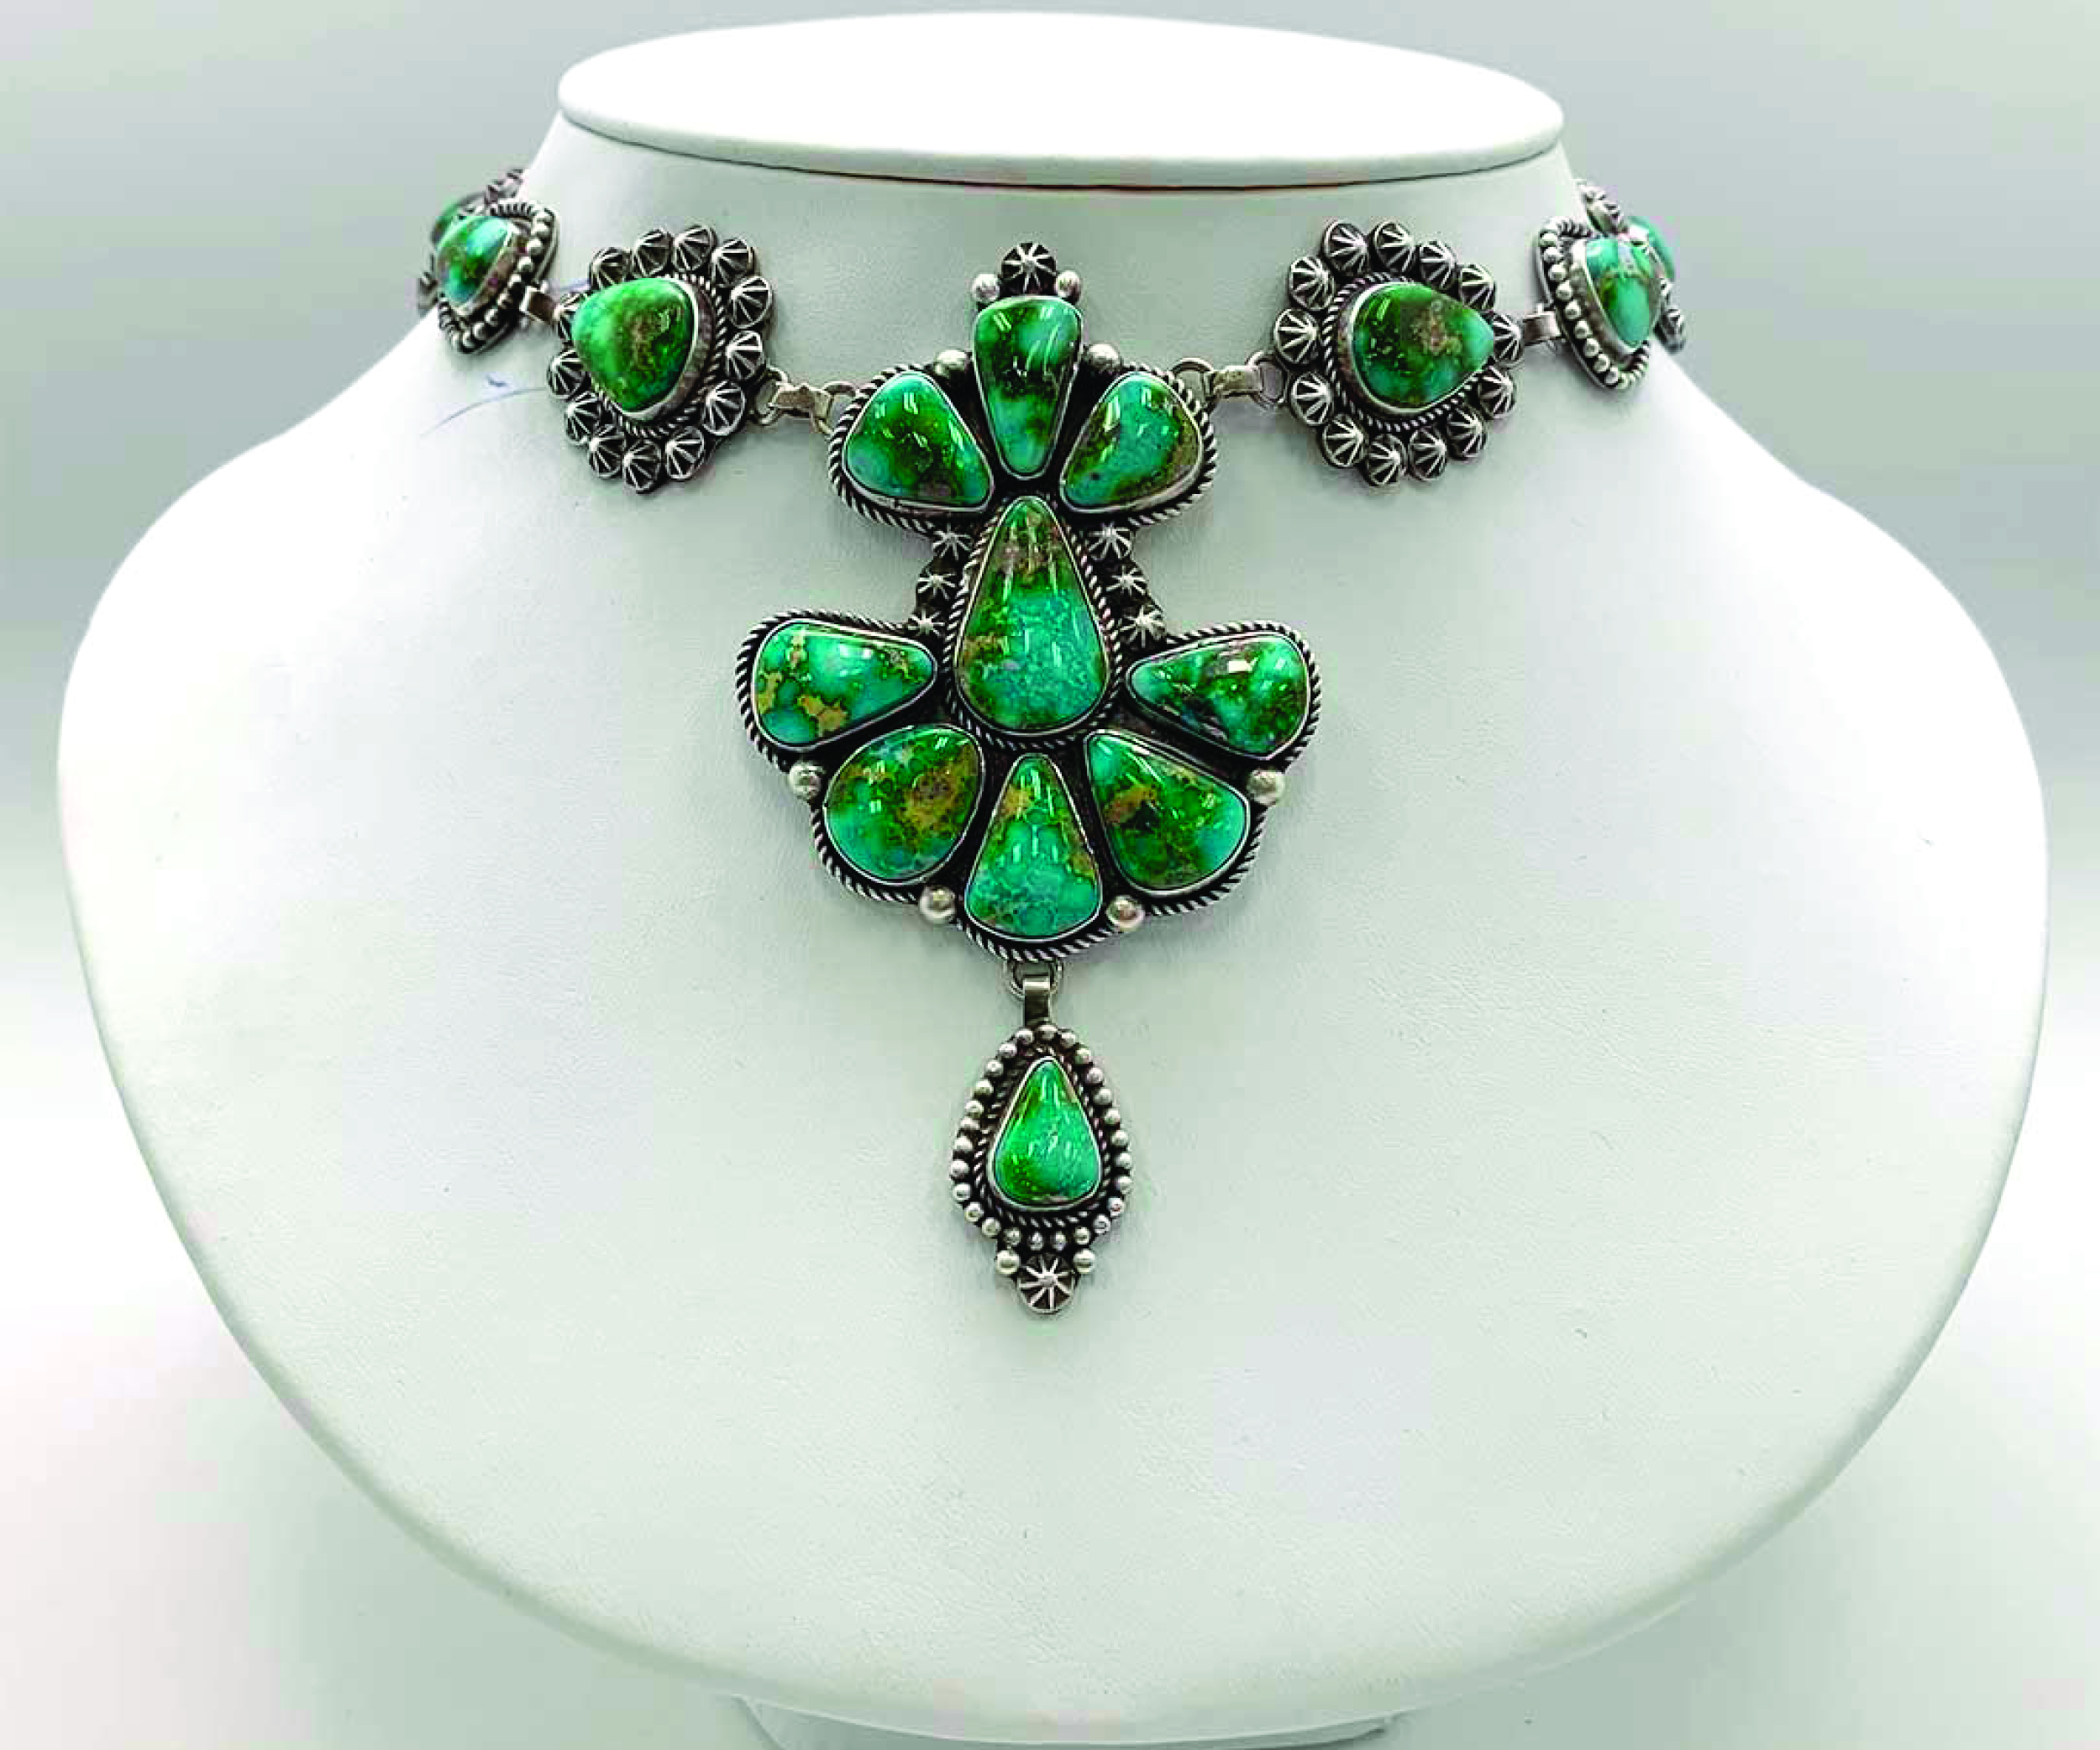 Sonoran Gold Lariat necklace by Randell endito